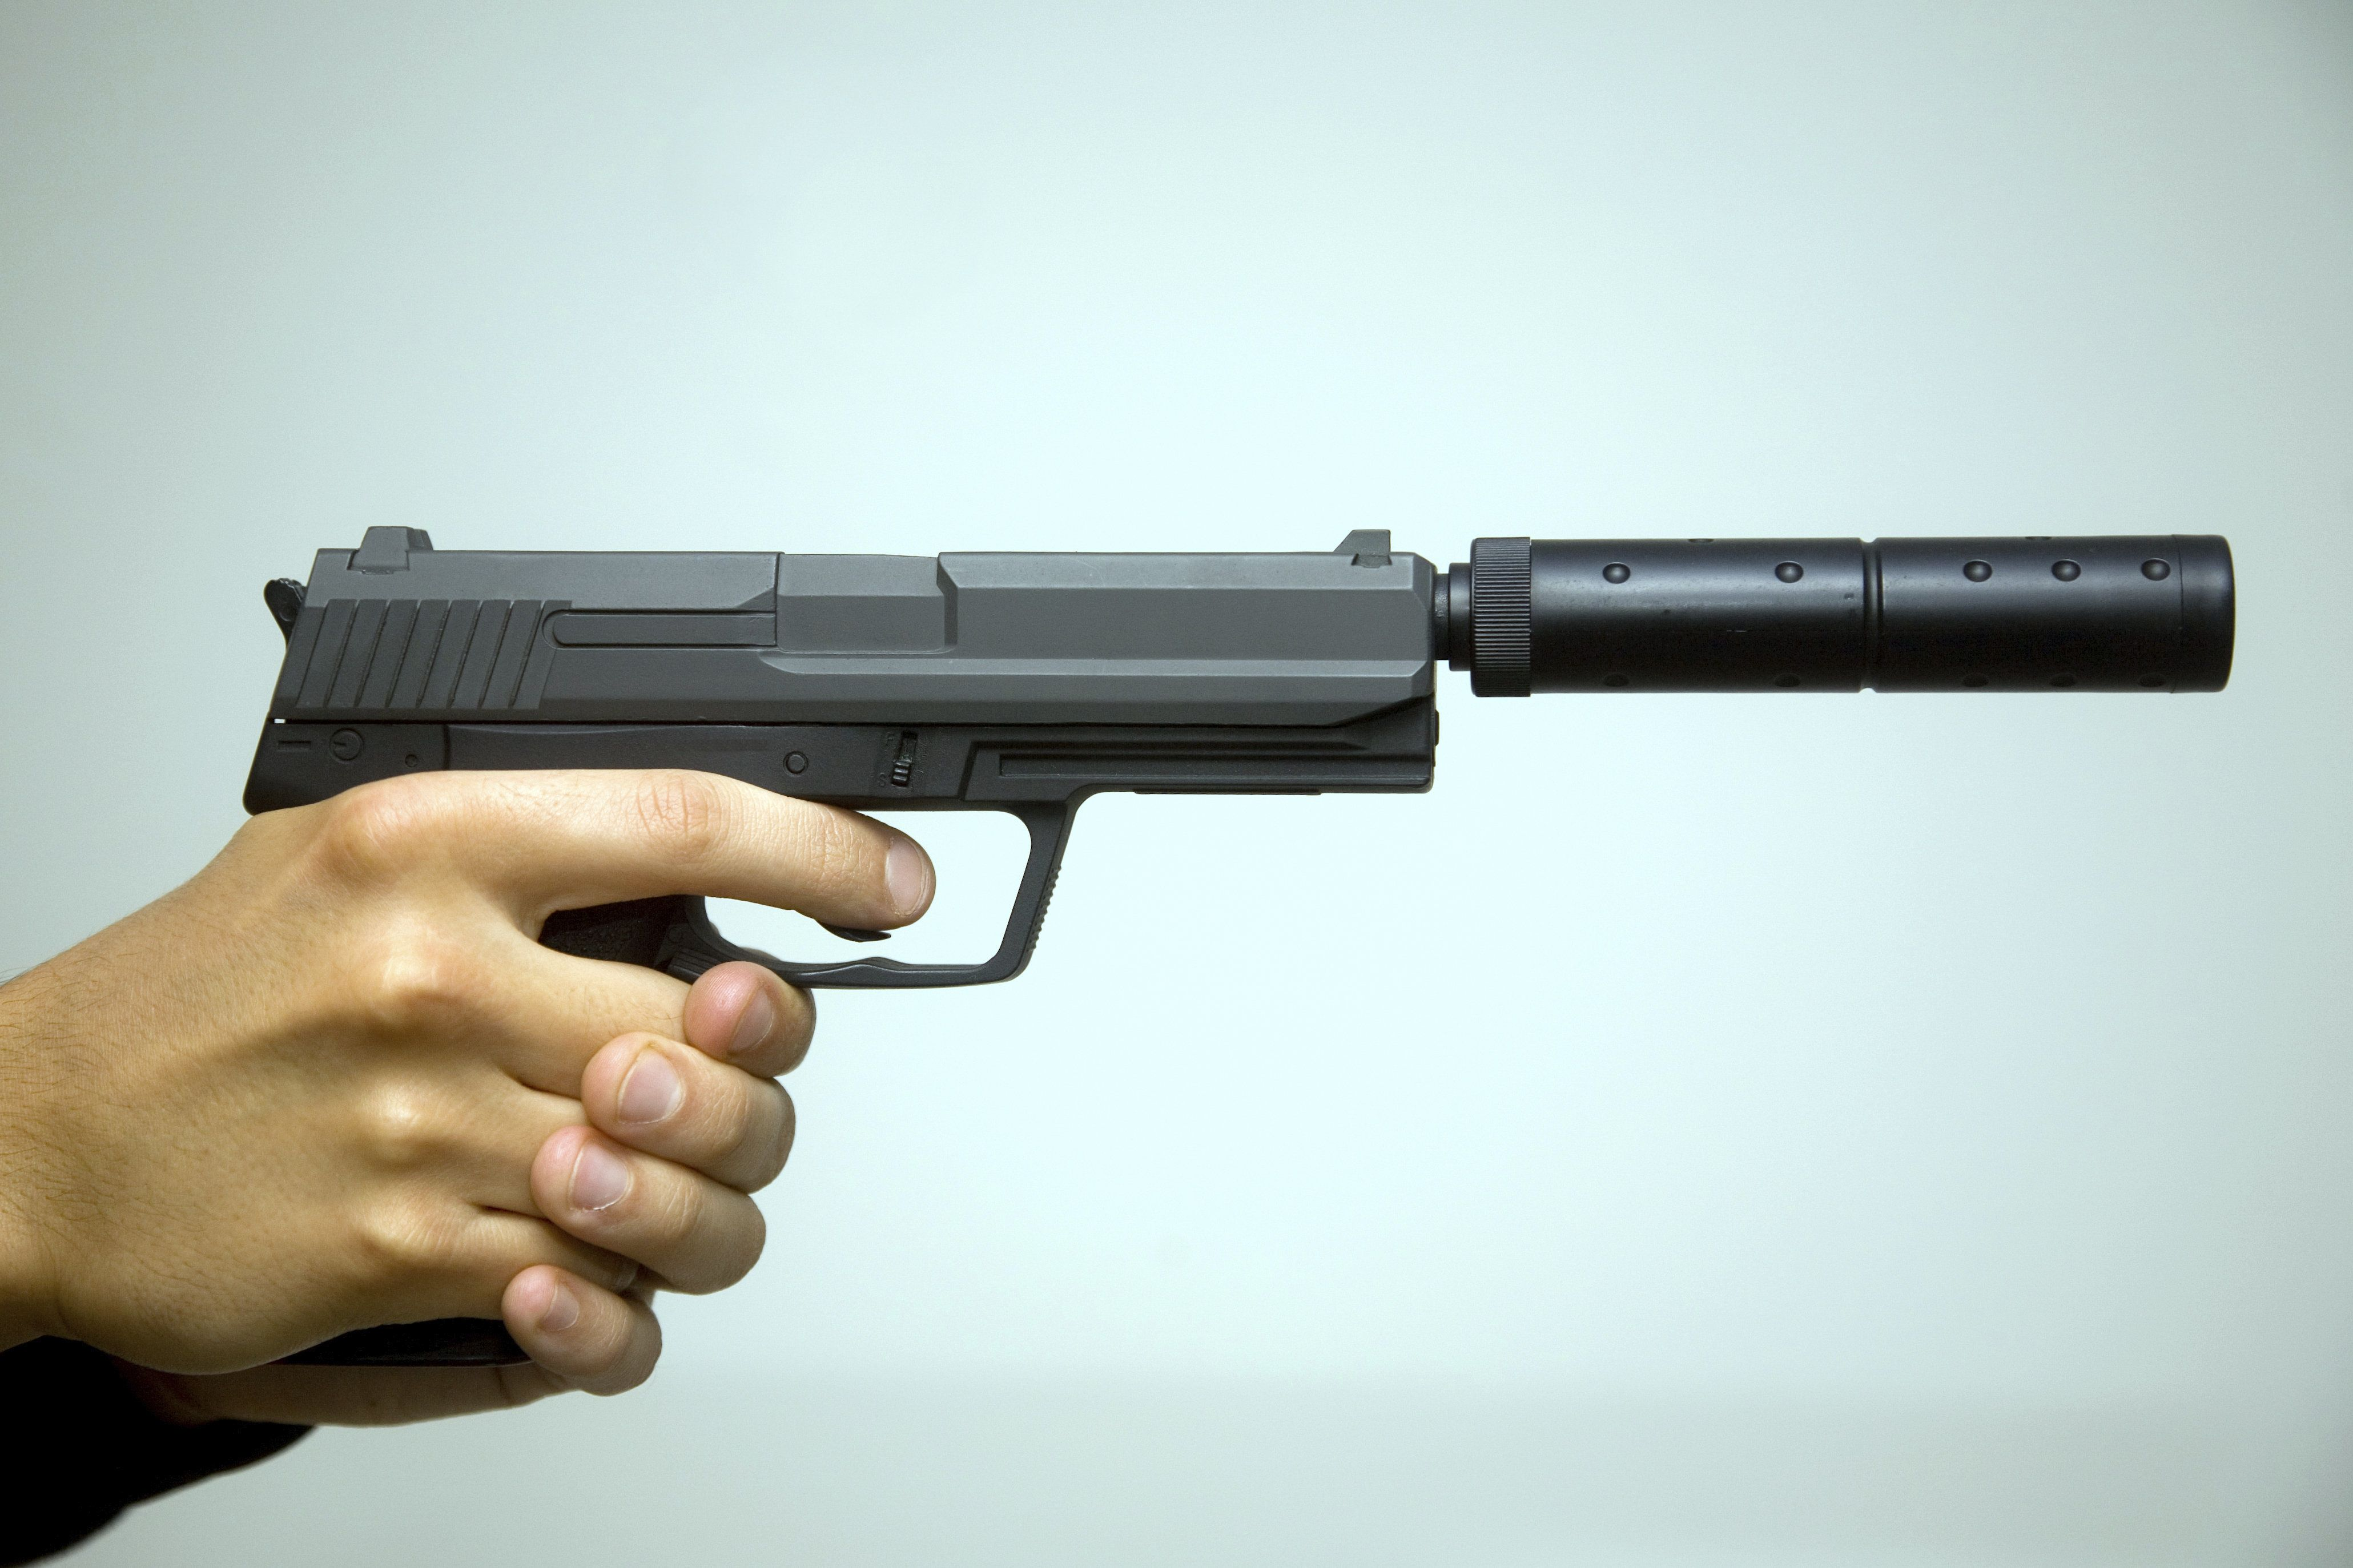 A semi automatic handgun with silencer.